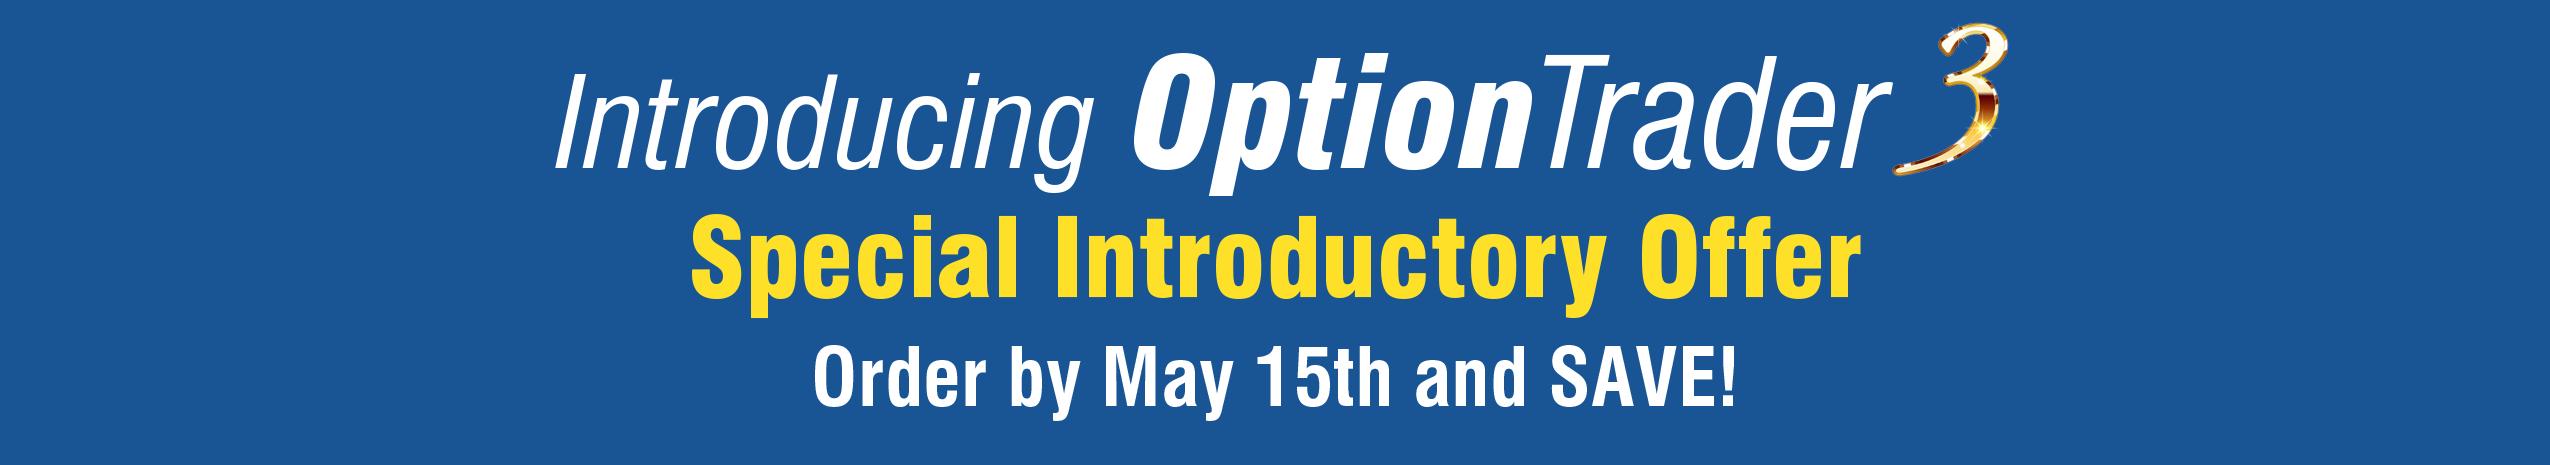 Cds options trading